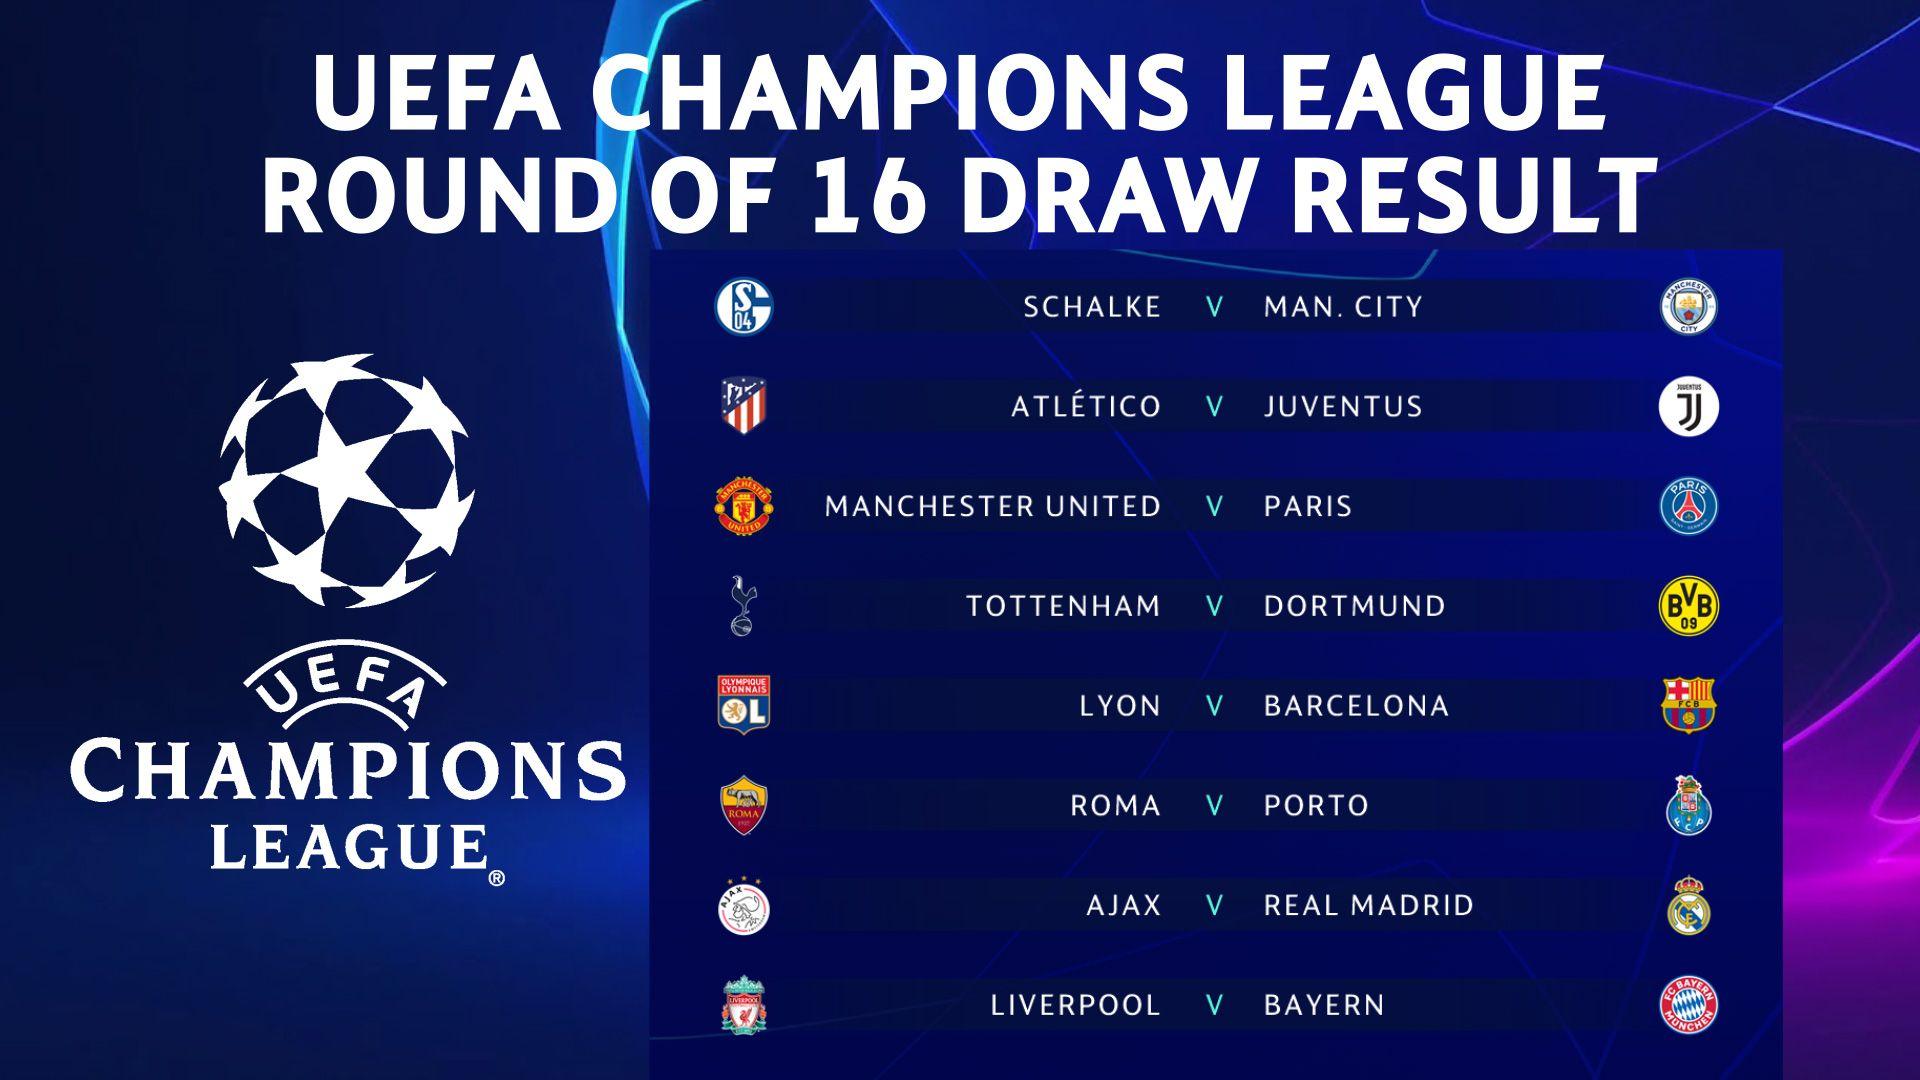 Uefa Champions League Round Of 16 Draw Result Ucldraw Https Www Youtube Com Watch V 8azhqny336g Feature Youtu Uefa Champions League Champions League League